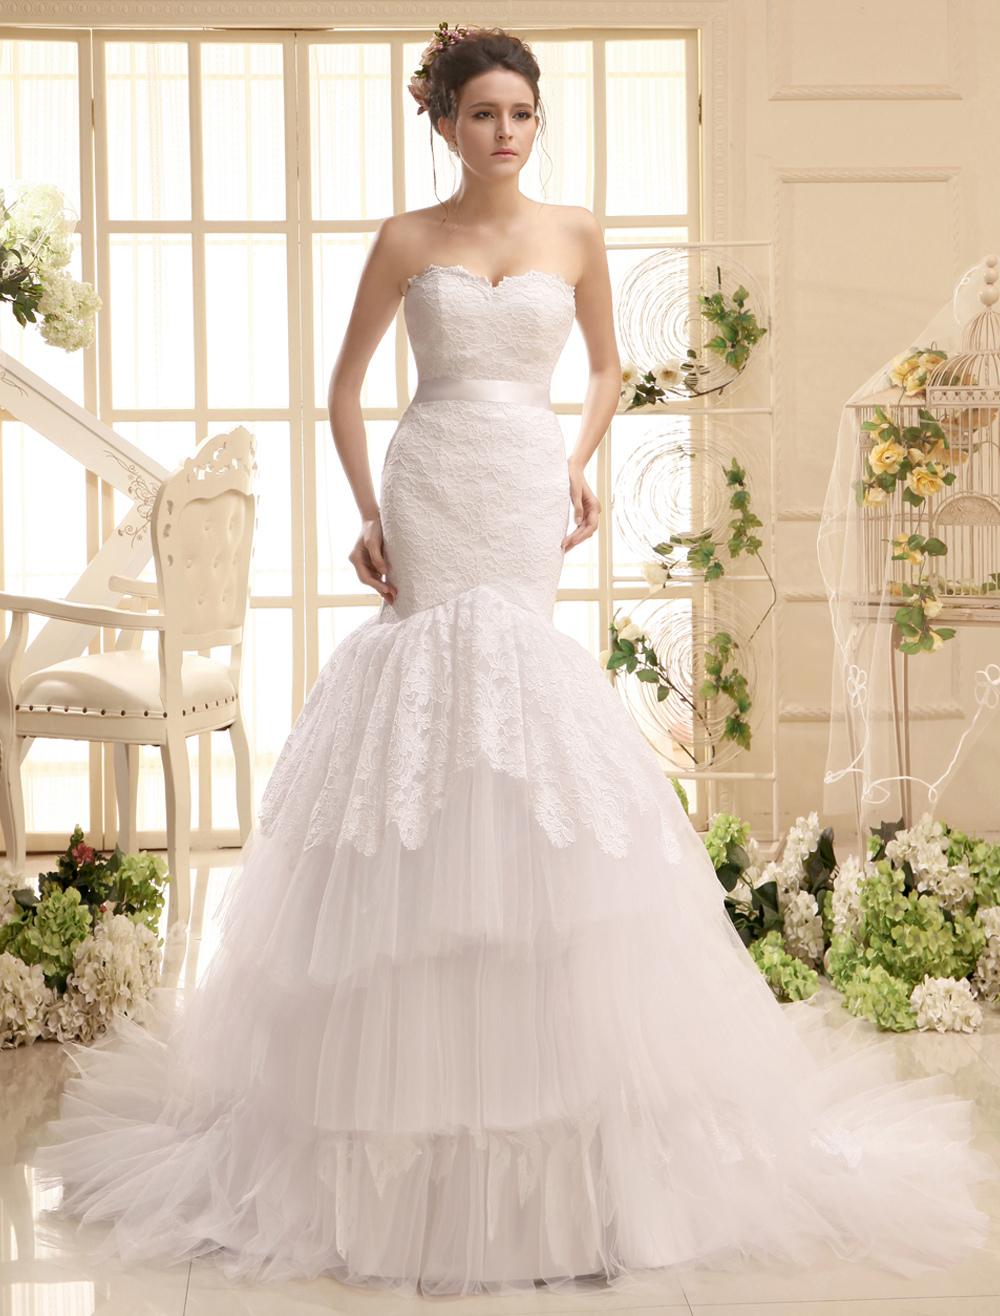 Court Train Sweetheart Neck Strapless Sash White Brides Wedding Dress photo